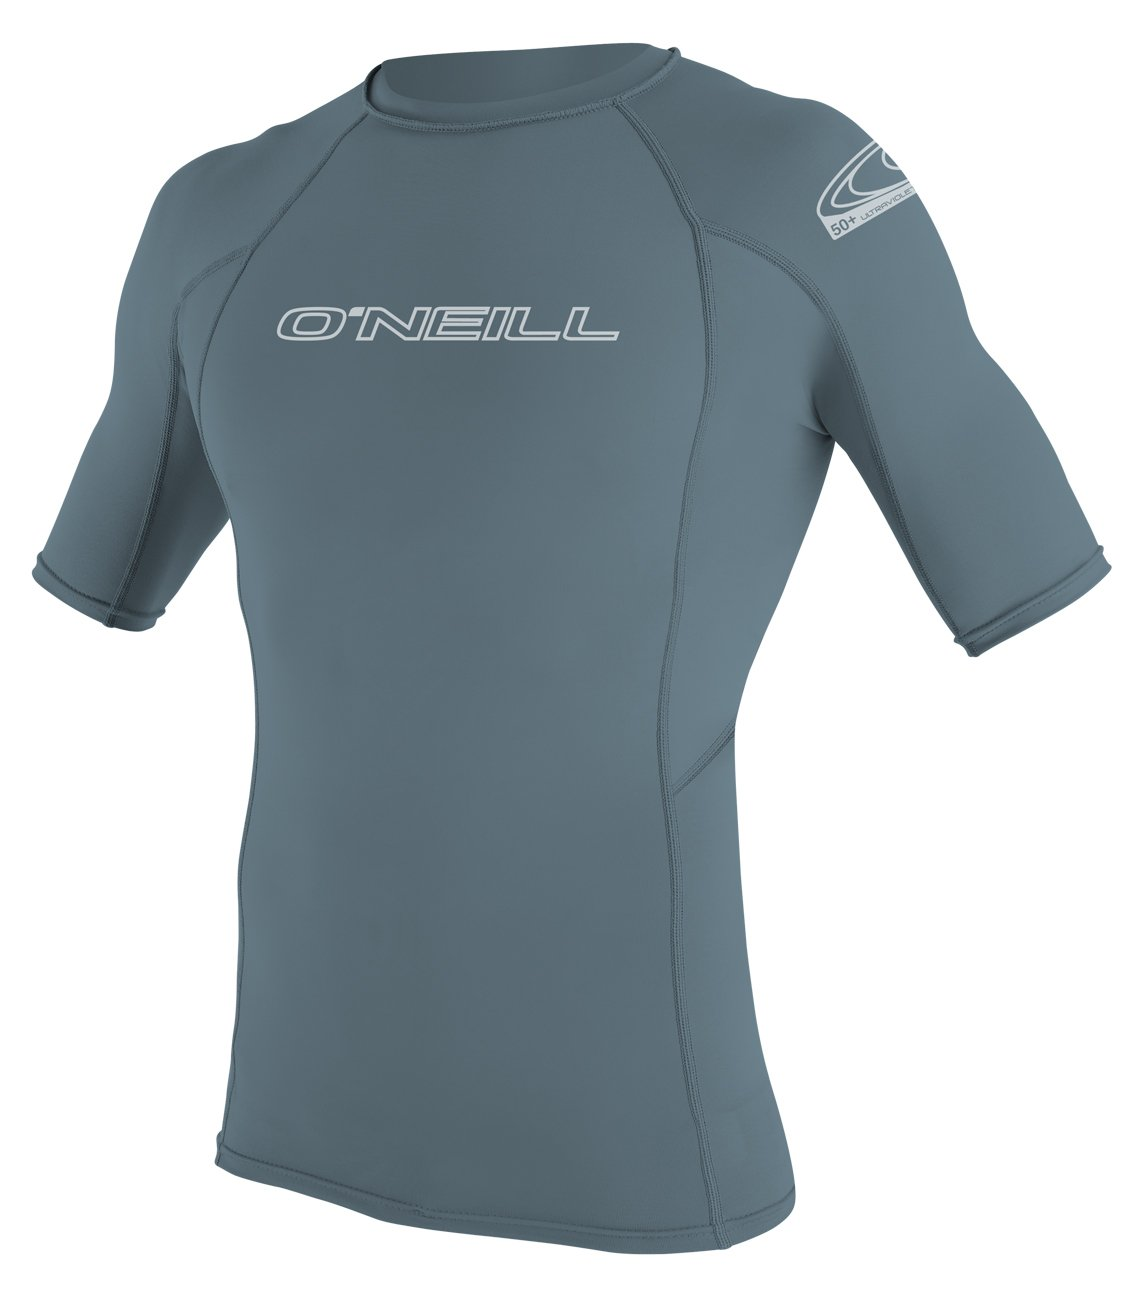 O'Neill Wetsuits Men's Basic Skins UPF 50+ Short Sleeve Rash Guard, Dusty Blue, Medium